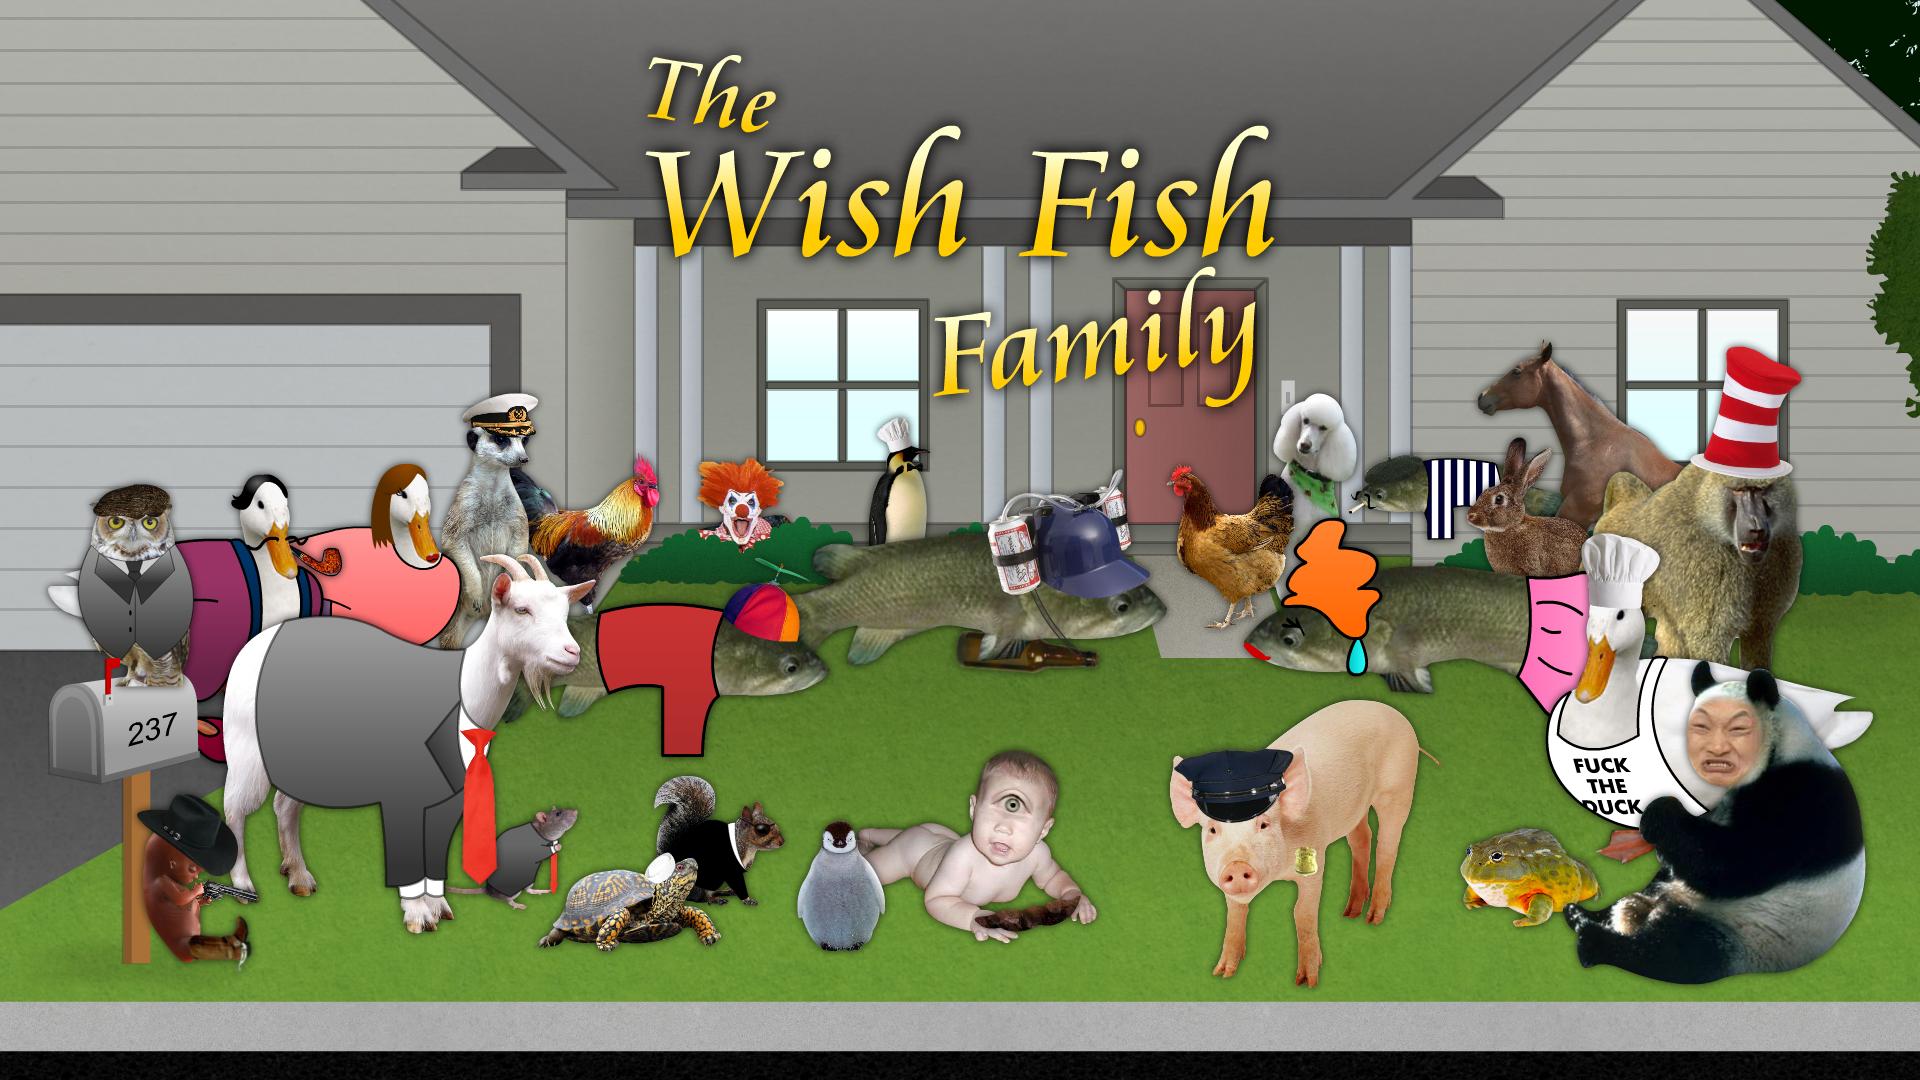 The Wish Fish Family